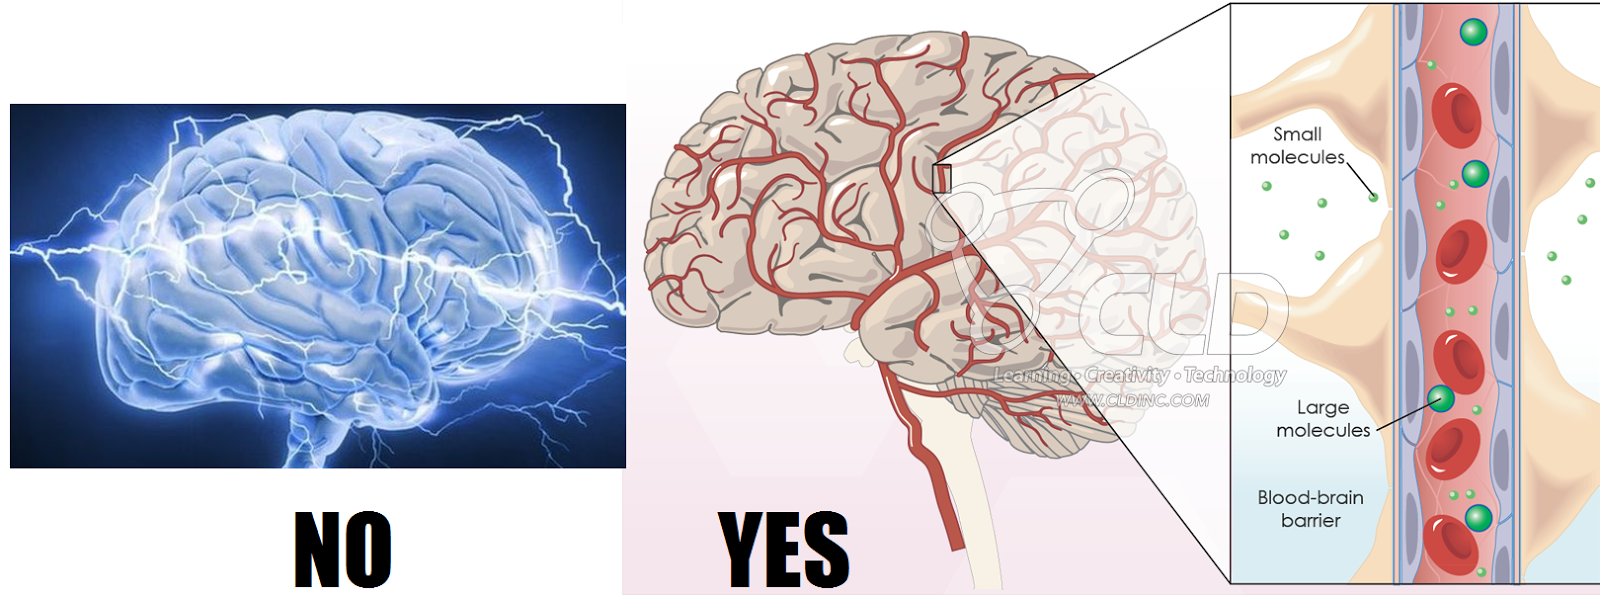 Post-Doc Ergo Propter Hoc: Bursting Bubbles Breach Blood-Brain ...